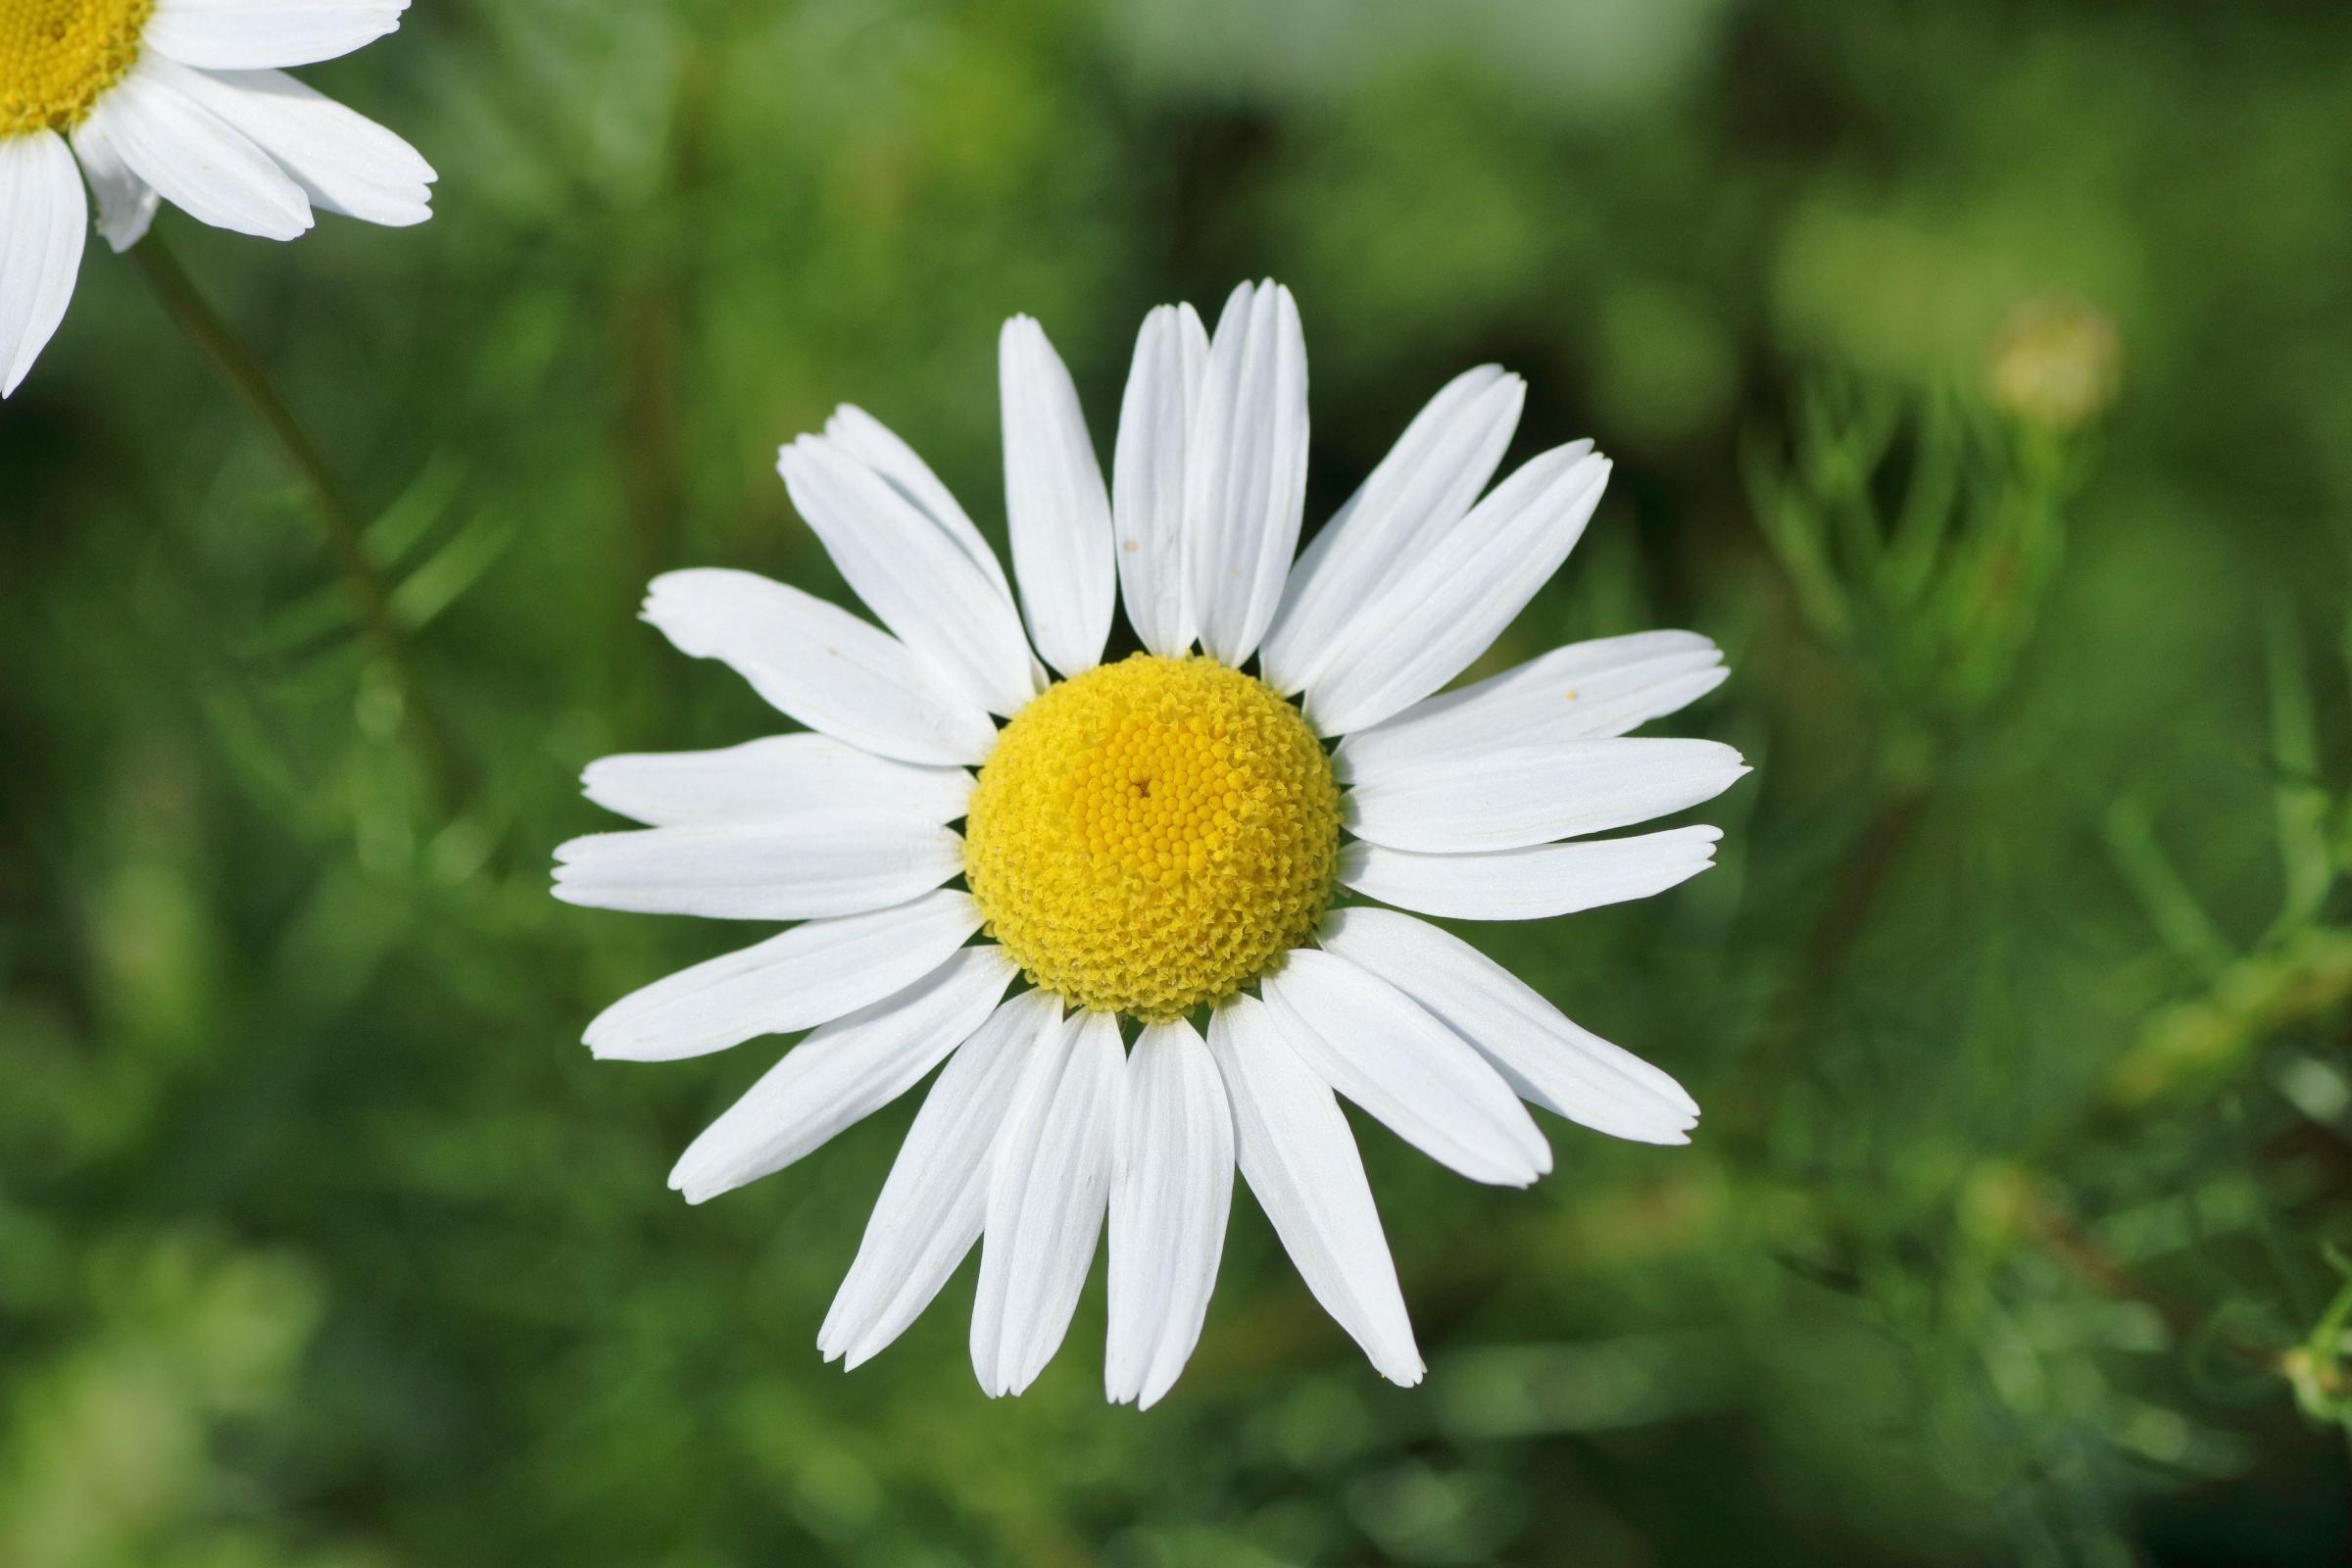 Blüte der Acker-Hundskamille